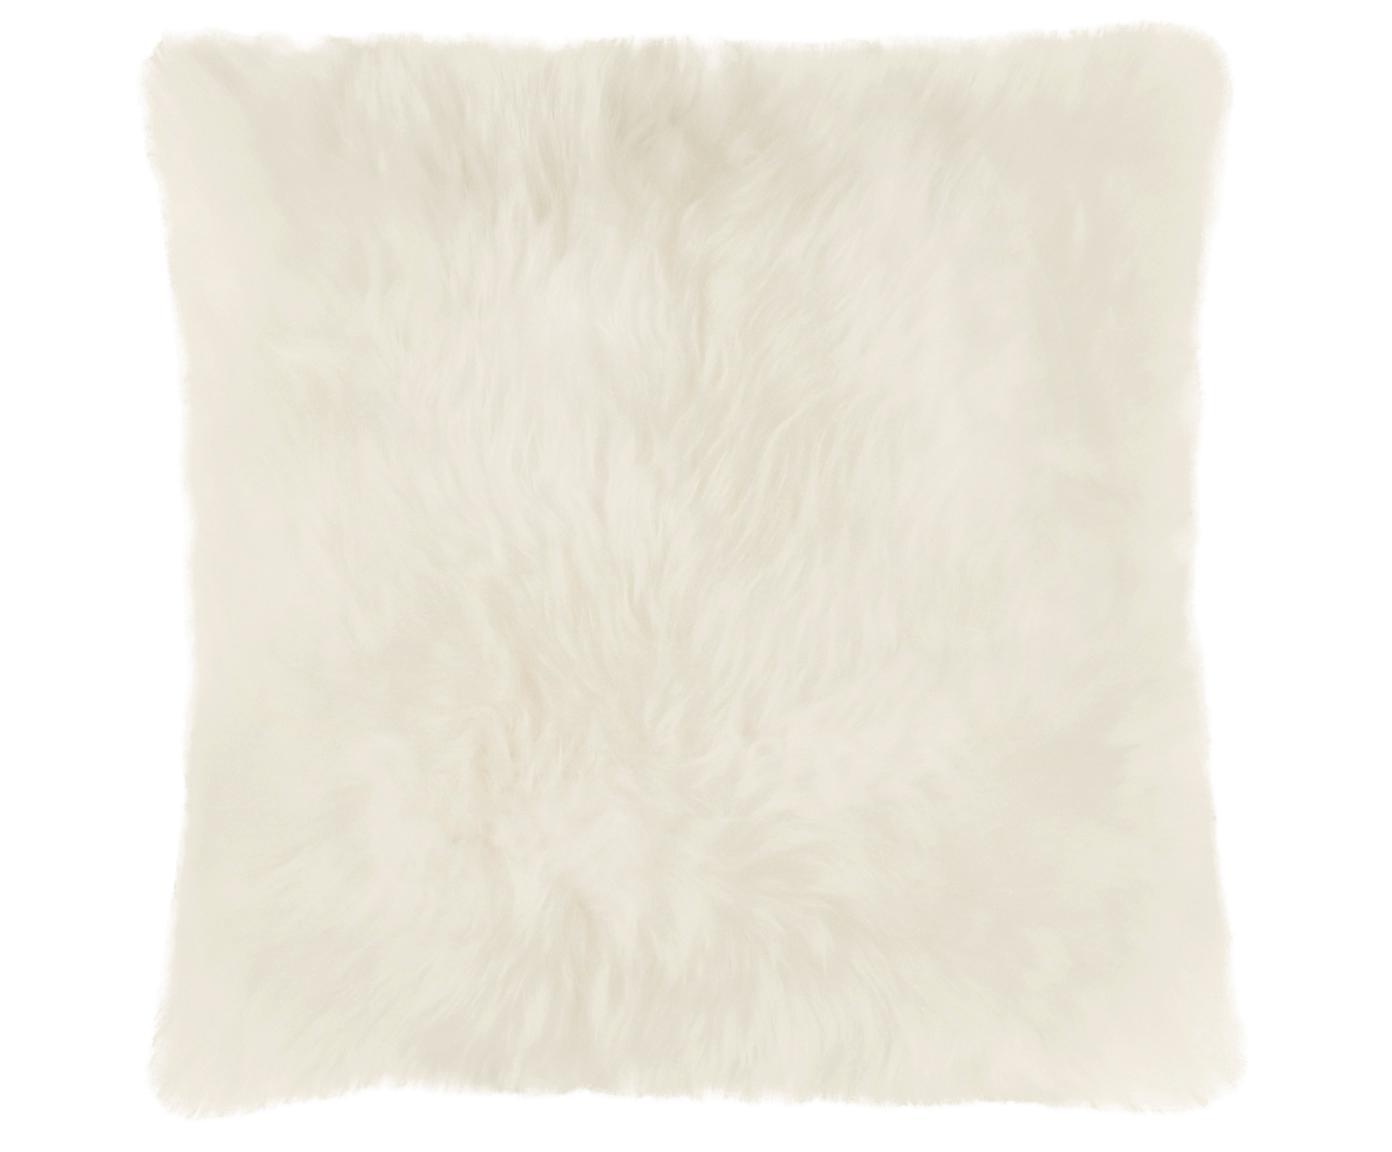 Funda de cojín de piel de oveja Oslo, Parte delantera: piel de oveja, Parte trasera: lino, Blanco crema, An 40 x L 40 cm